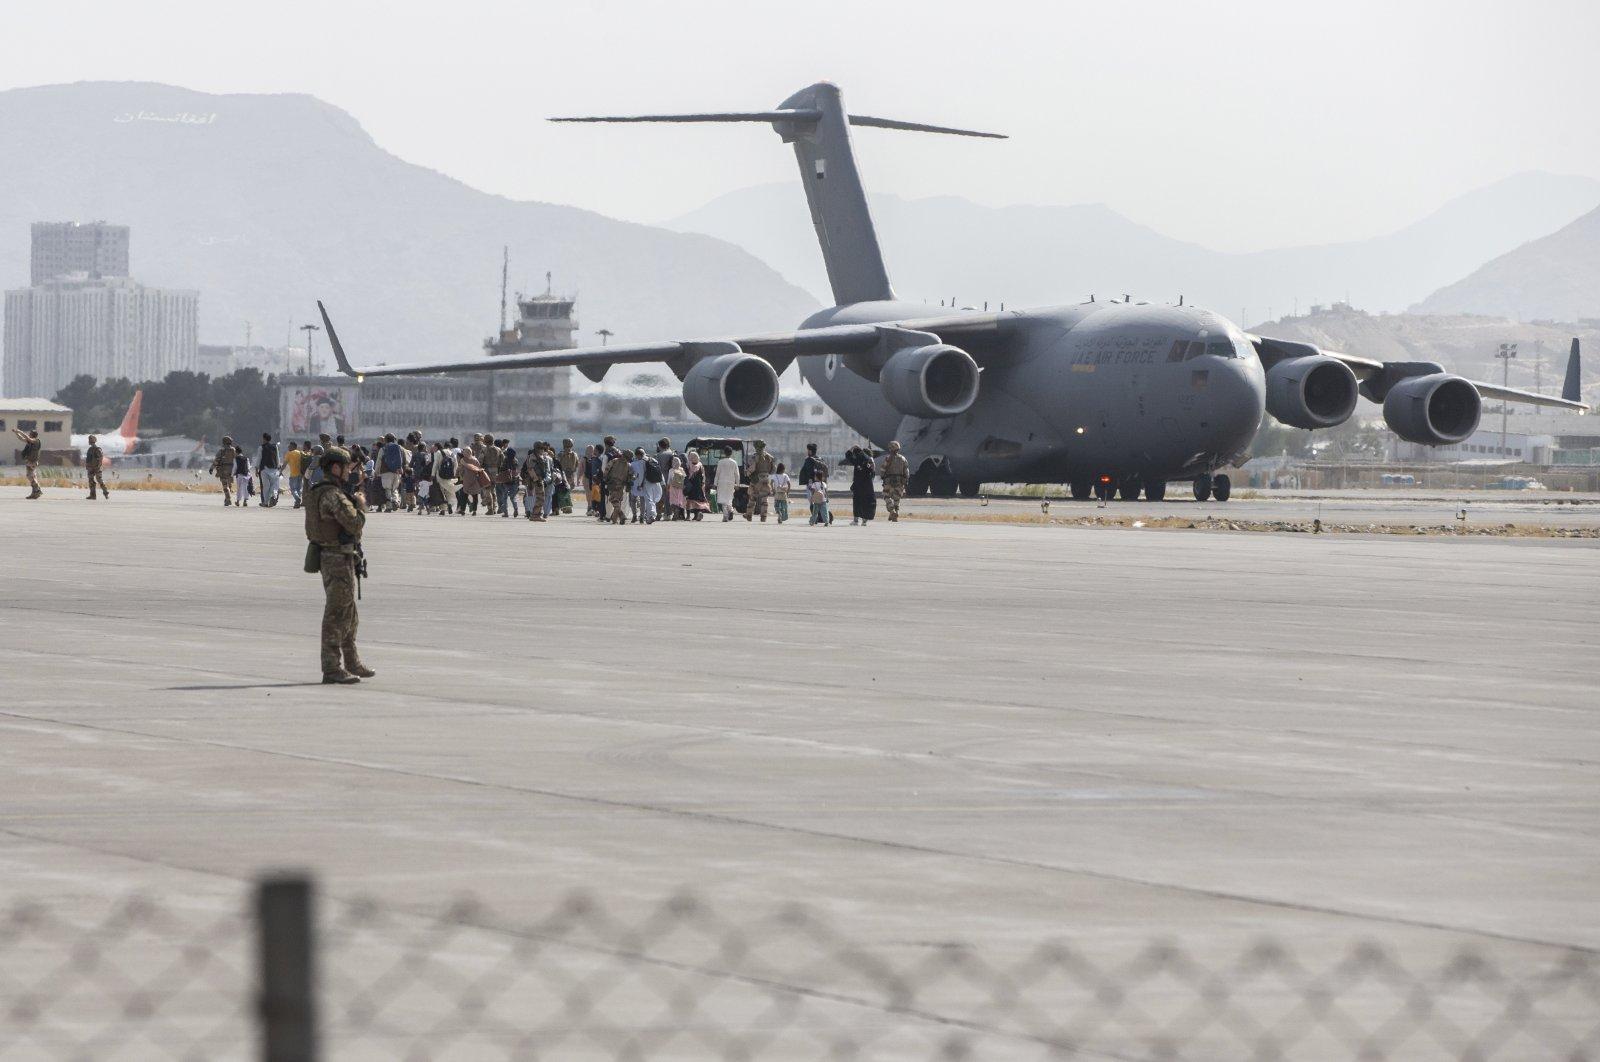 In this photo provided by the U.S. Marine Corps, evacuees load onto a U.S. Air Force Boeing C-17 Globemaster III during an evacuation at Kabul Hamid Karzai International Airport, Kabul, Afghanistan, Aug. 21, 2021. (Sgt. Samuel Ruiz/U.S. Marine Corps via AP)